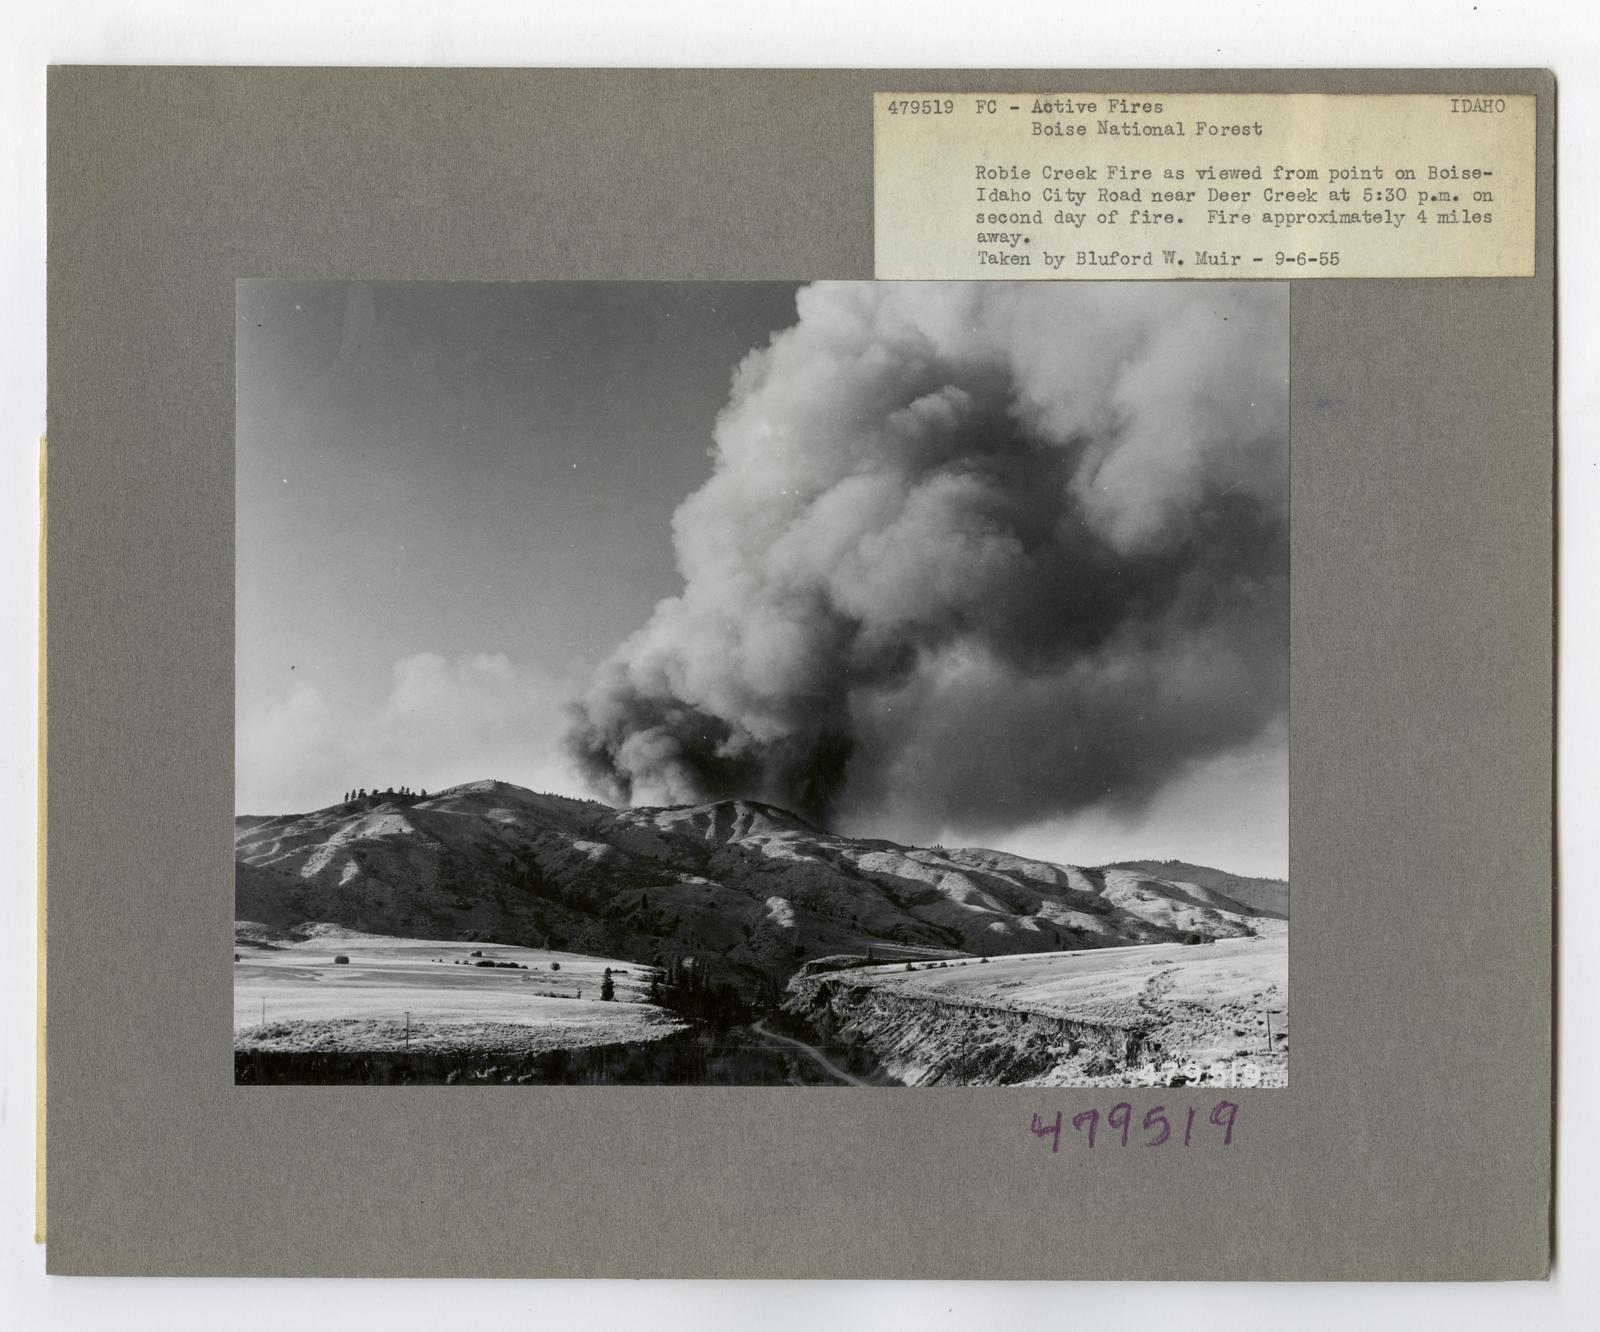 Active Fires - Idaho